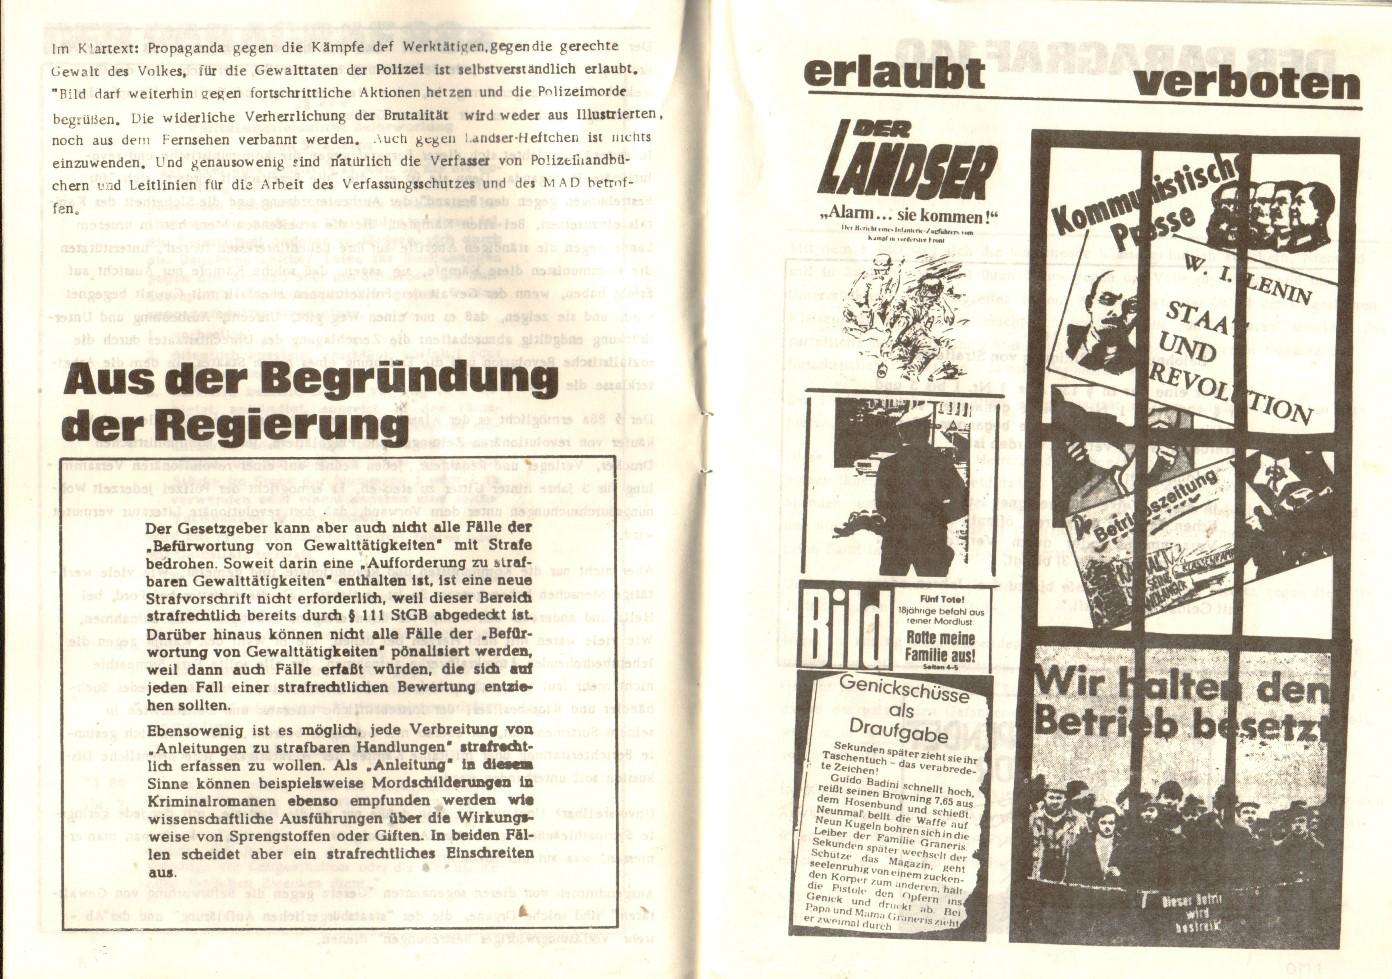 RHD_1976_Doku_Strafrechtsaenderungsgesetz_05